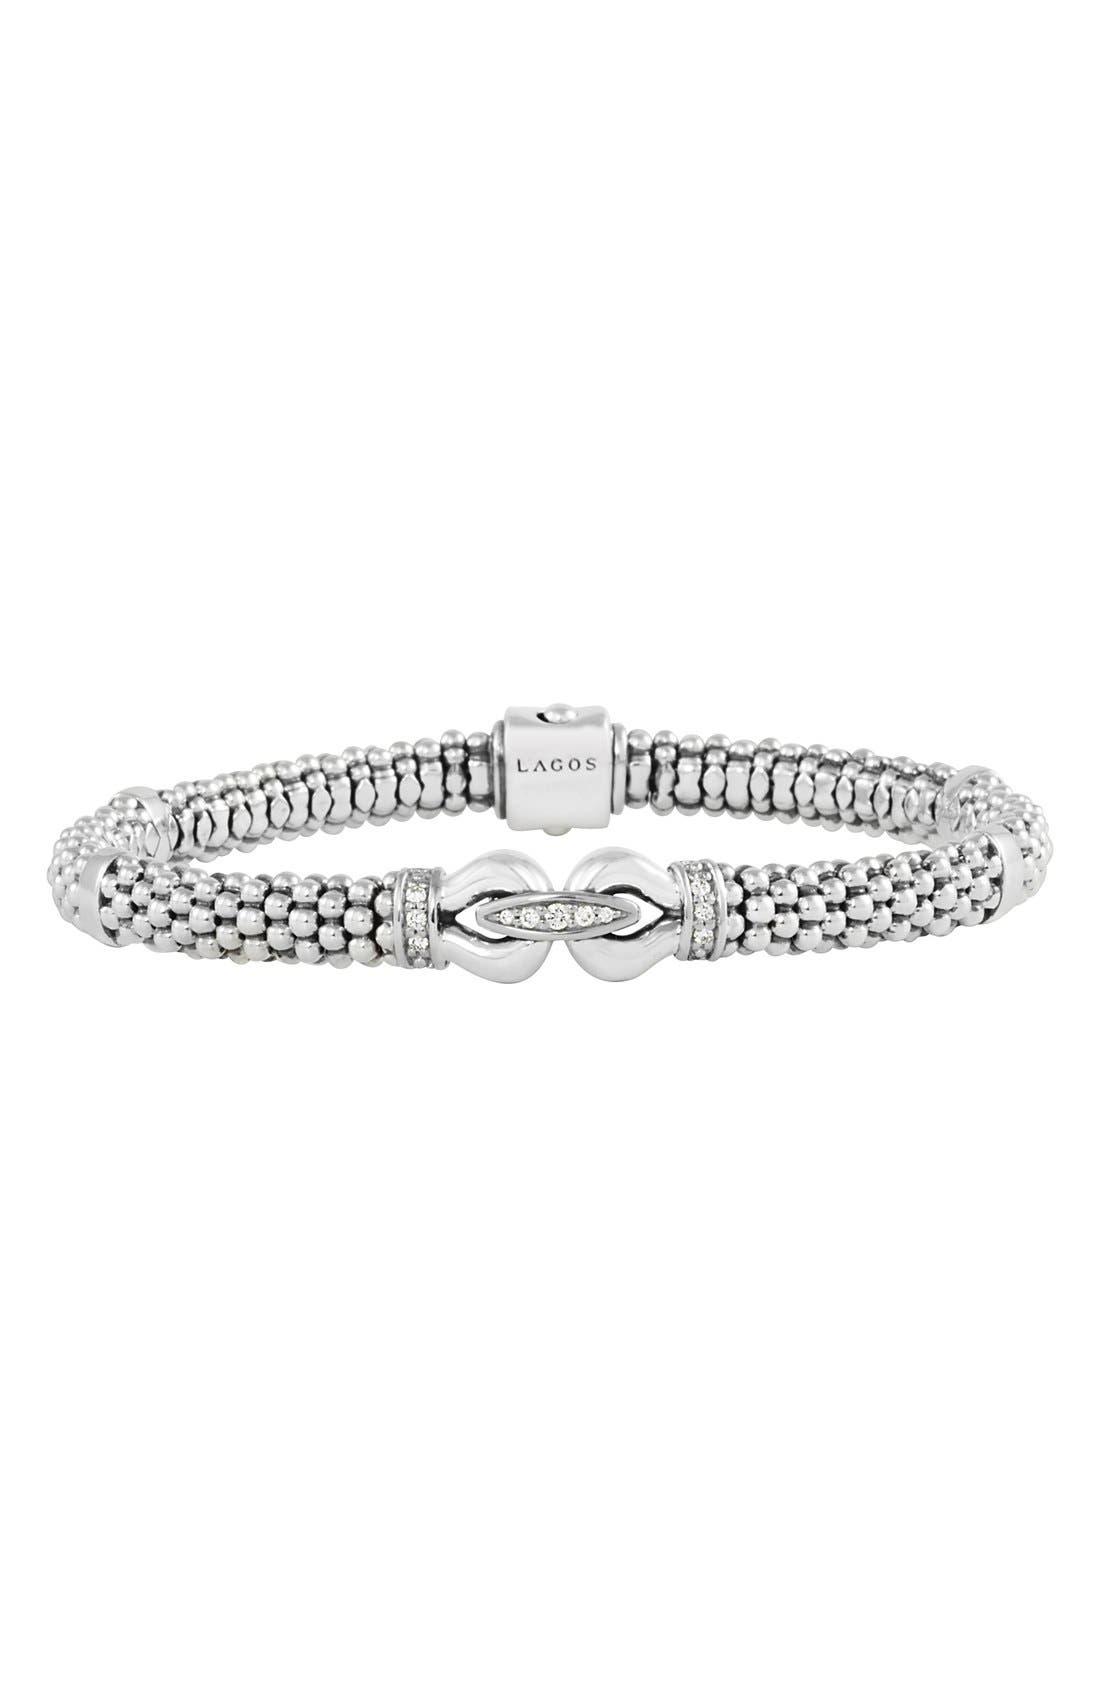 LAGOS 'Derby' Diamond Buckle Rope Bracelet